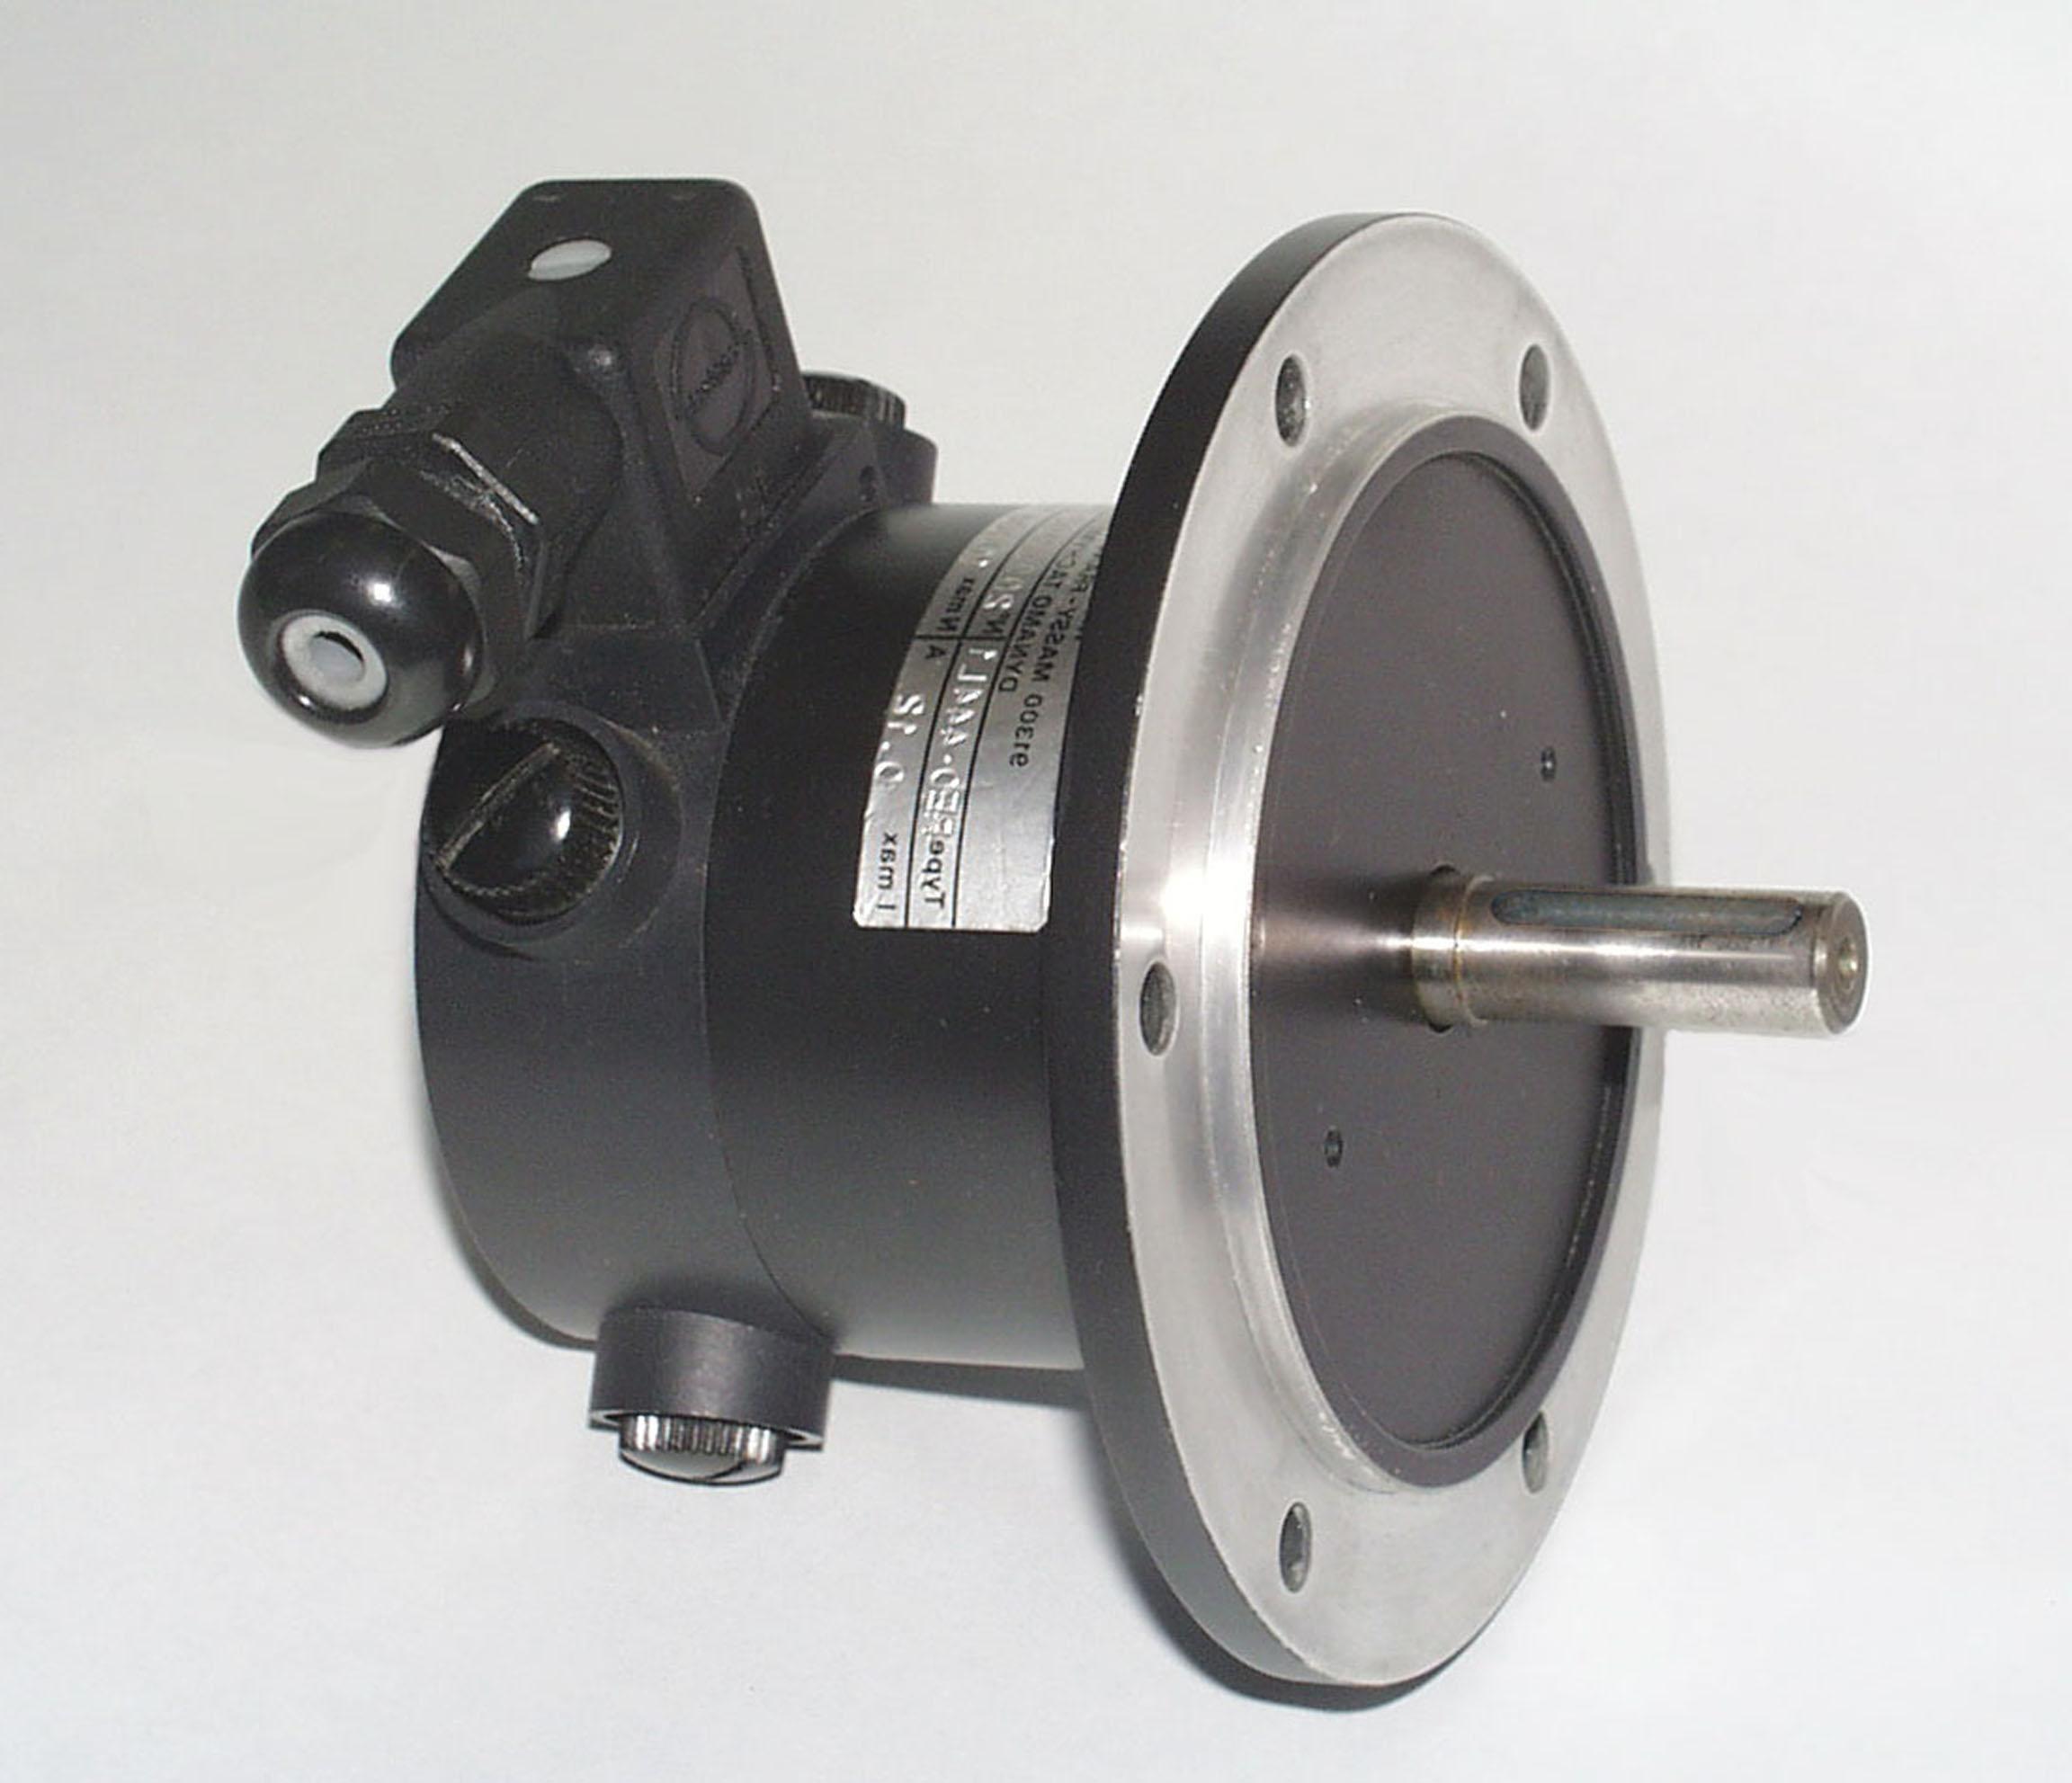 Dinamo tacométrica Eje saliente (60V, 11mm, Brida)